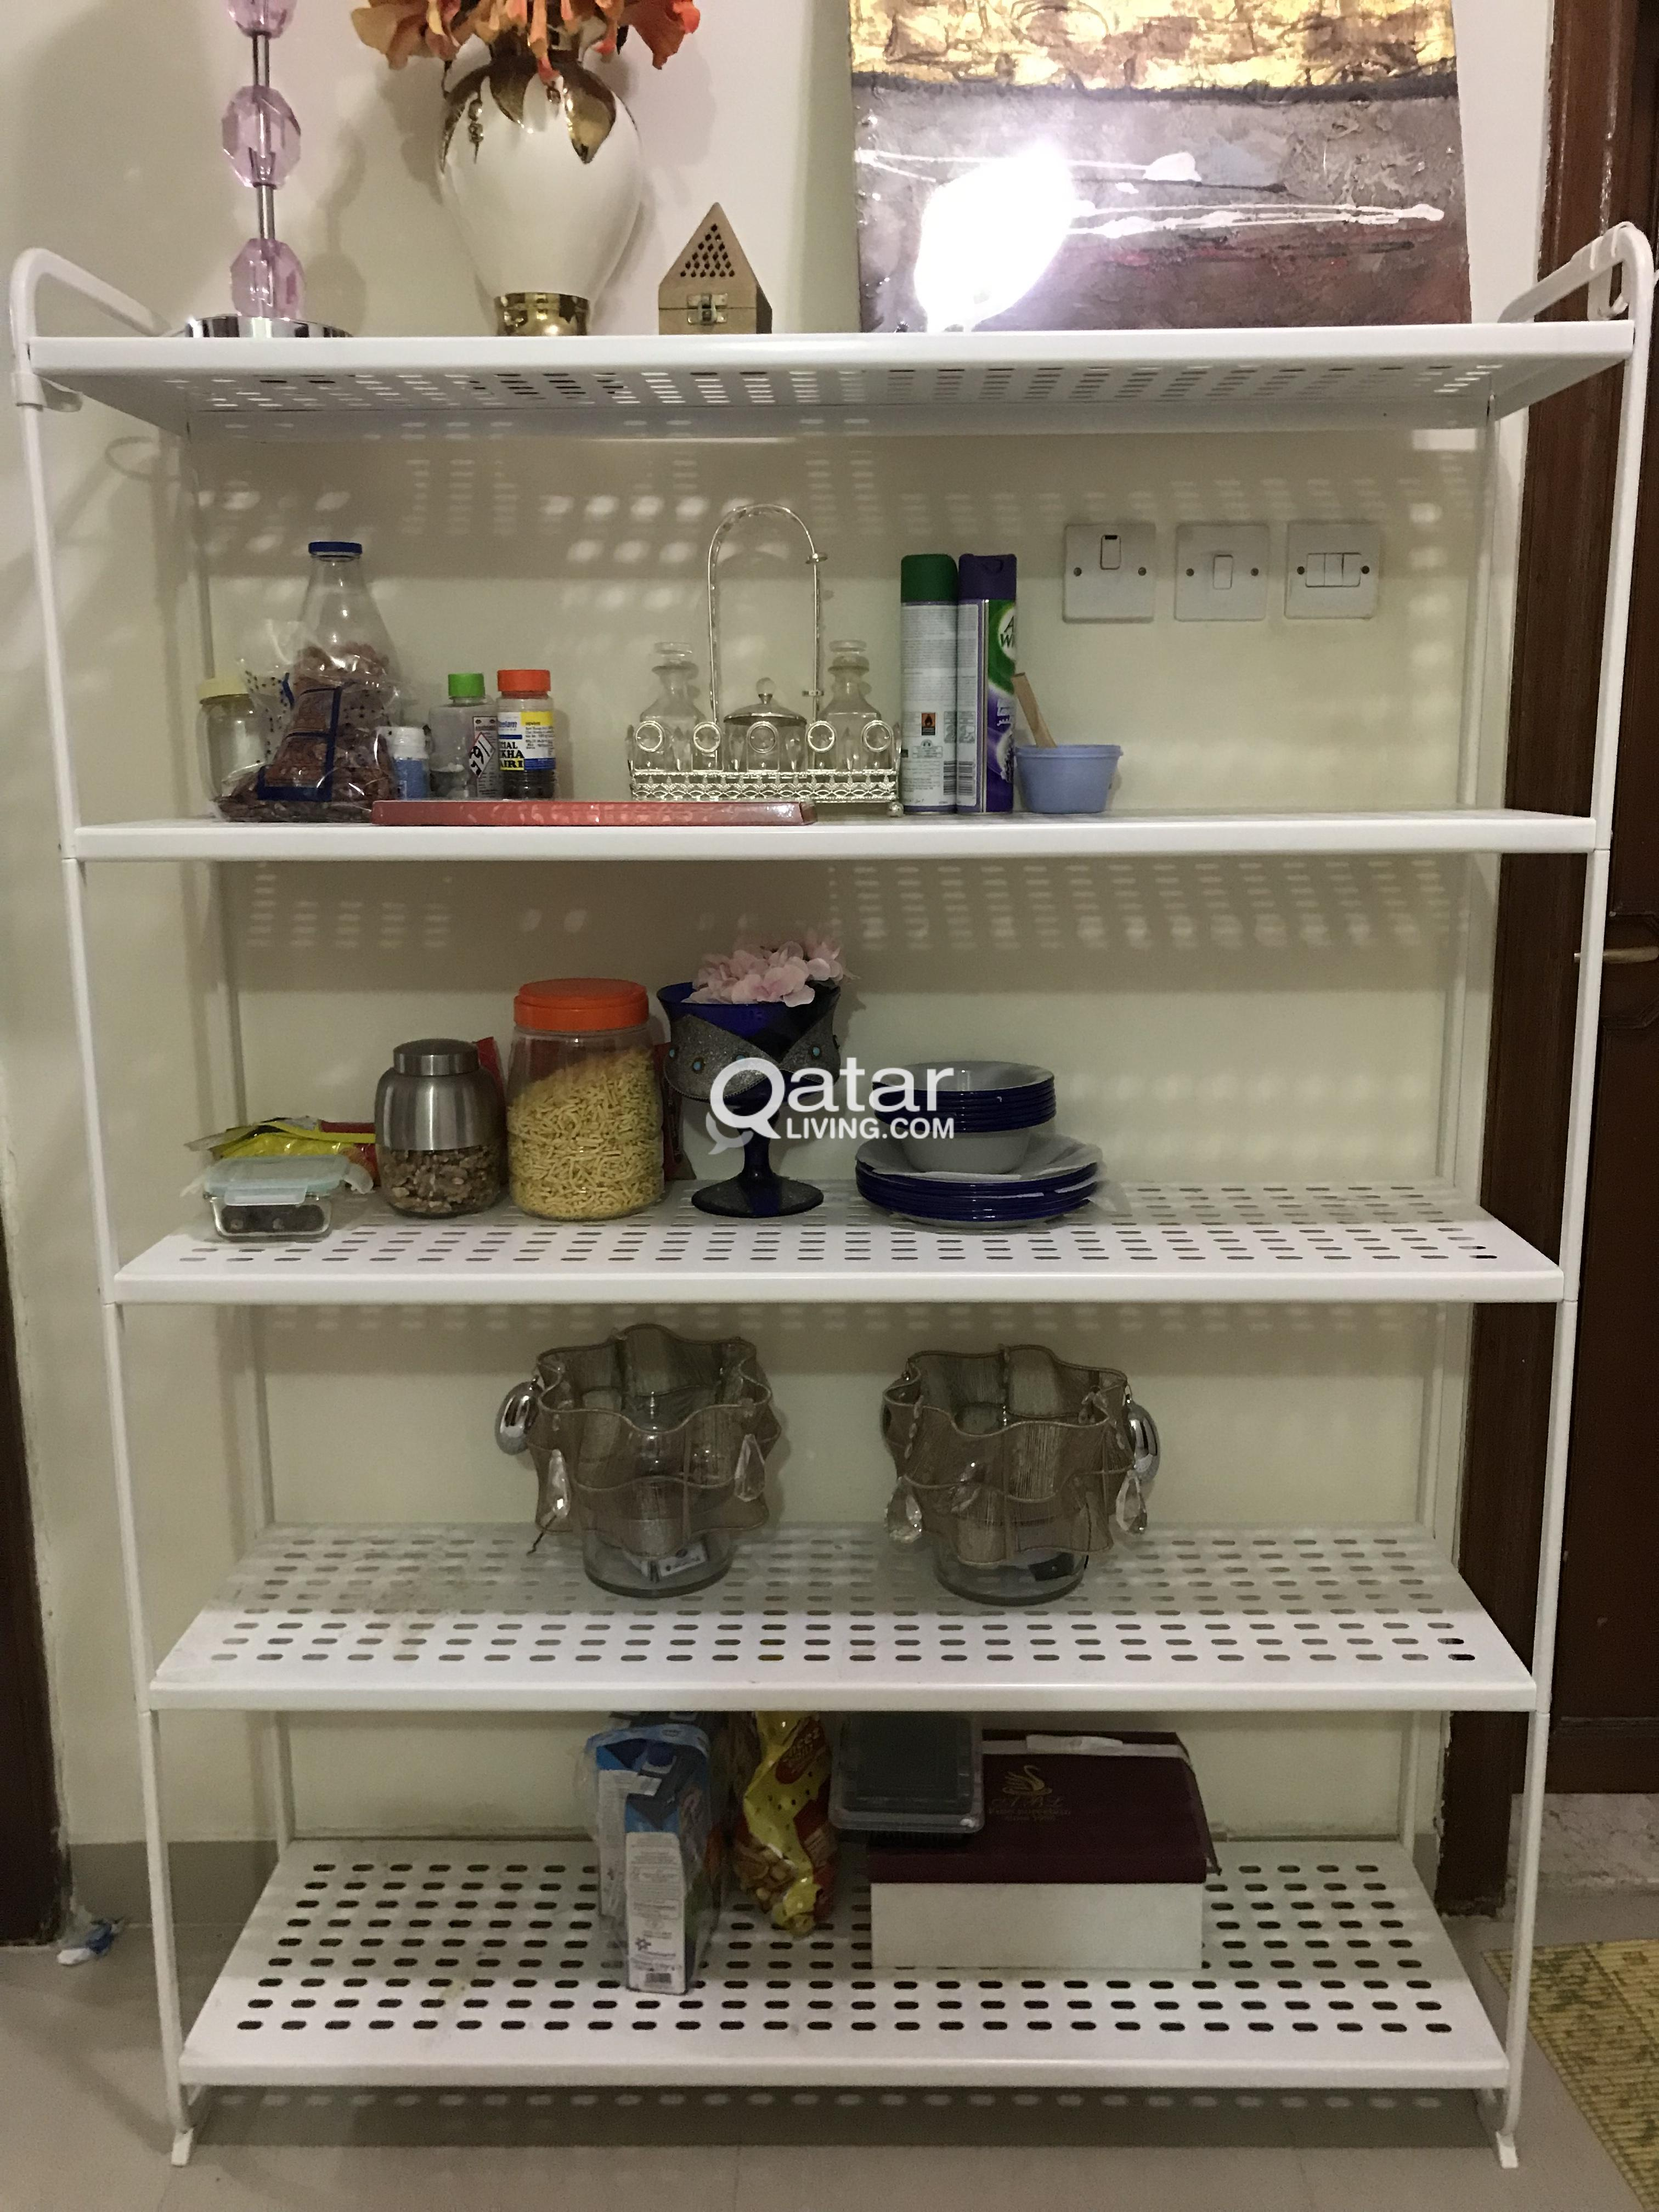 Kitchen Rack Metal From Ikea Qatar Living